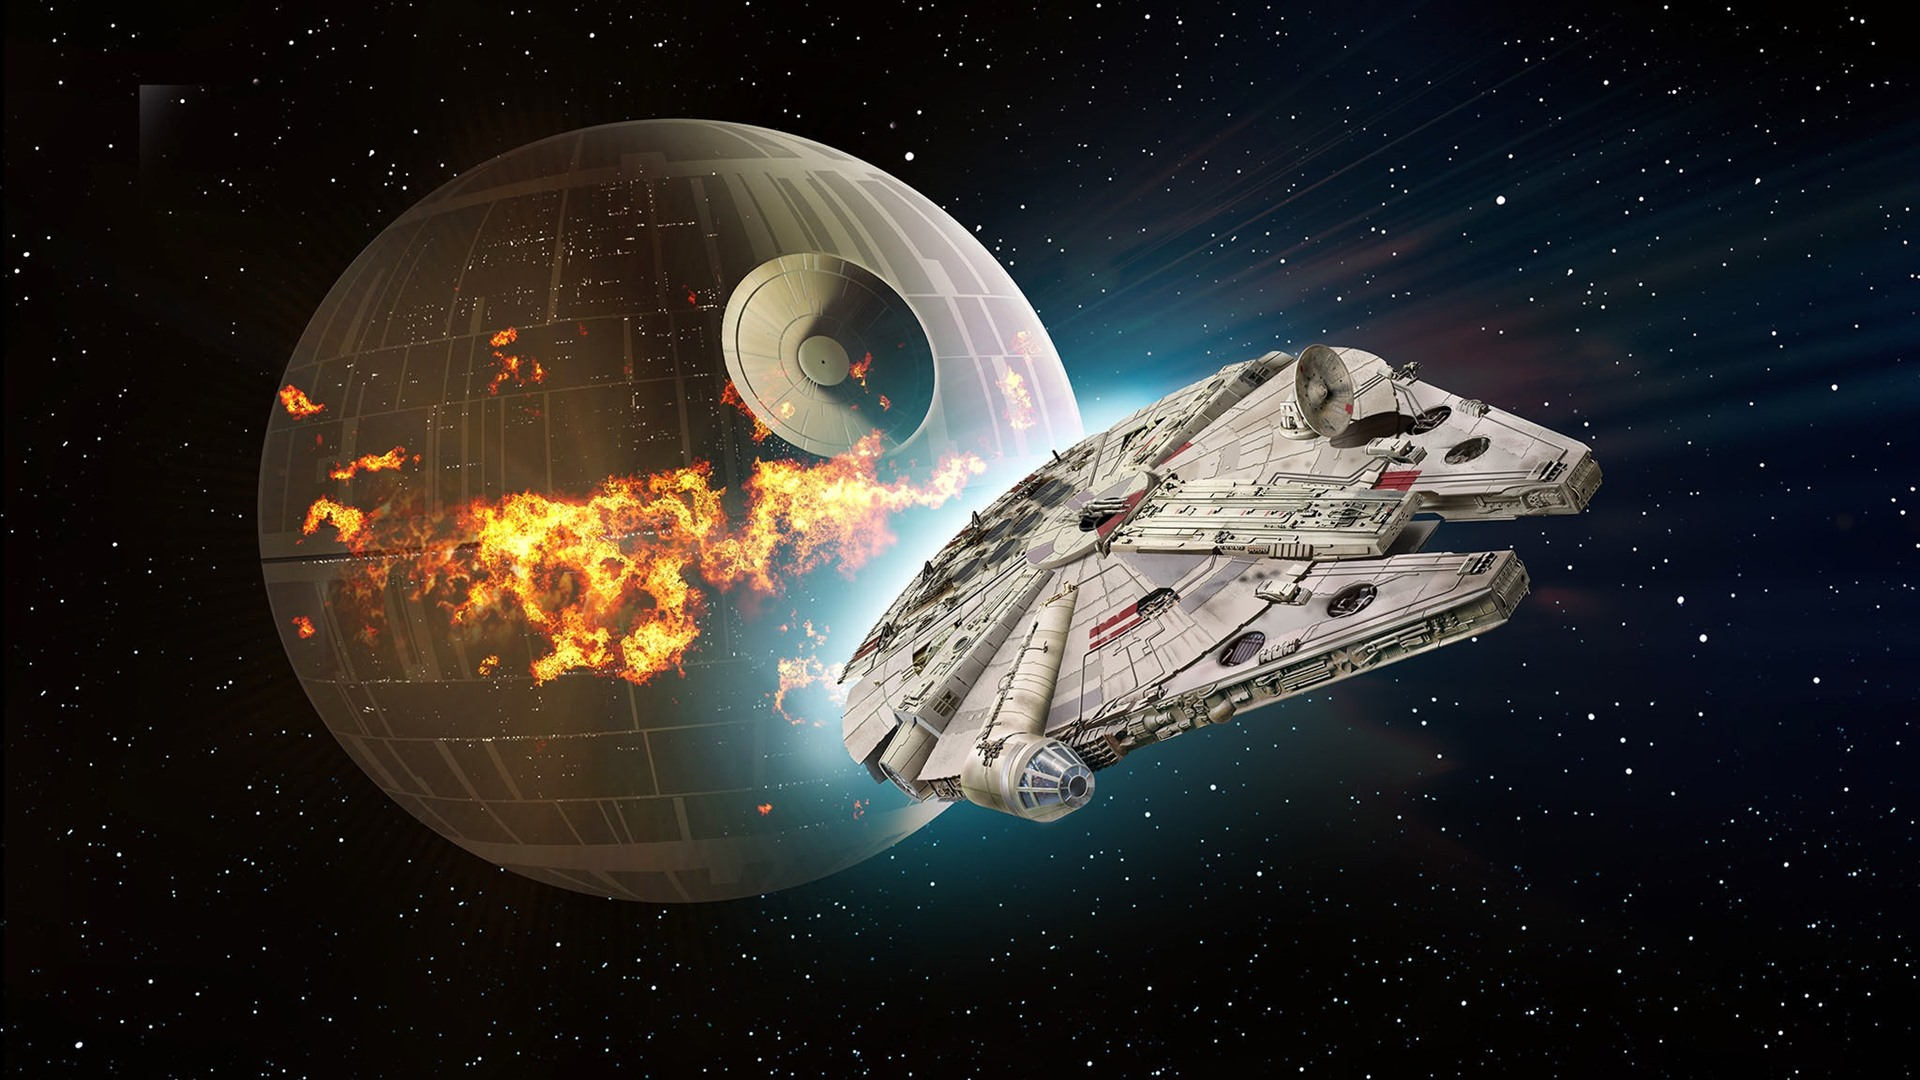 Wallpaper Star Wars, Death Star, spaceship 1920x1200 HD